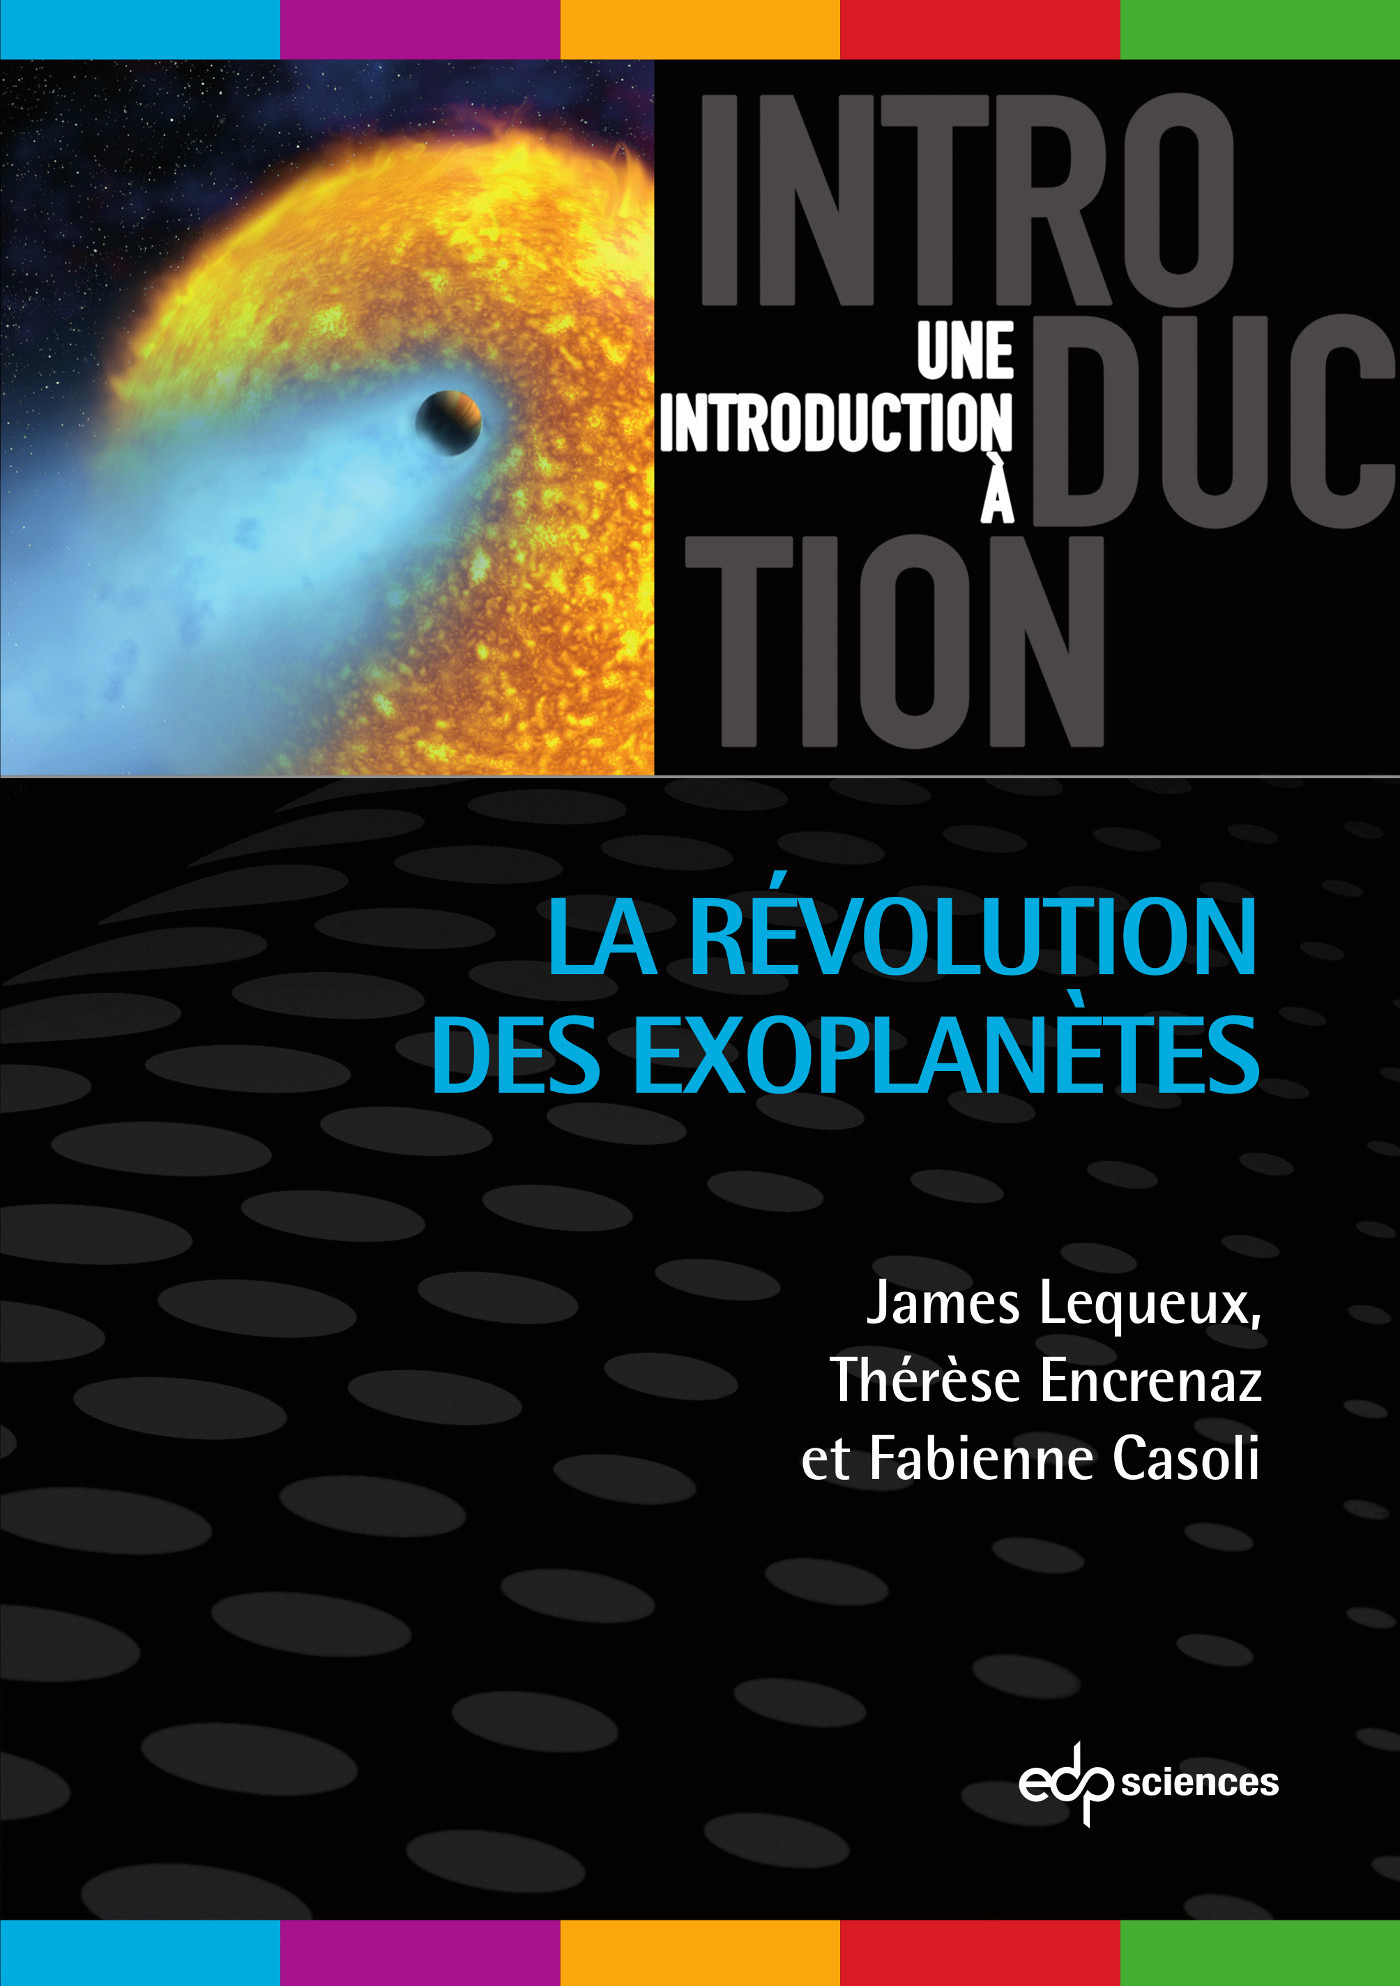 LA REVOLUTION DES EXOPLANETES